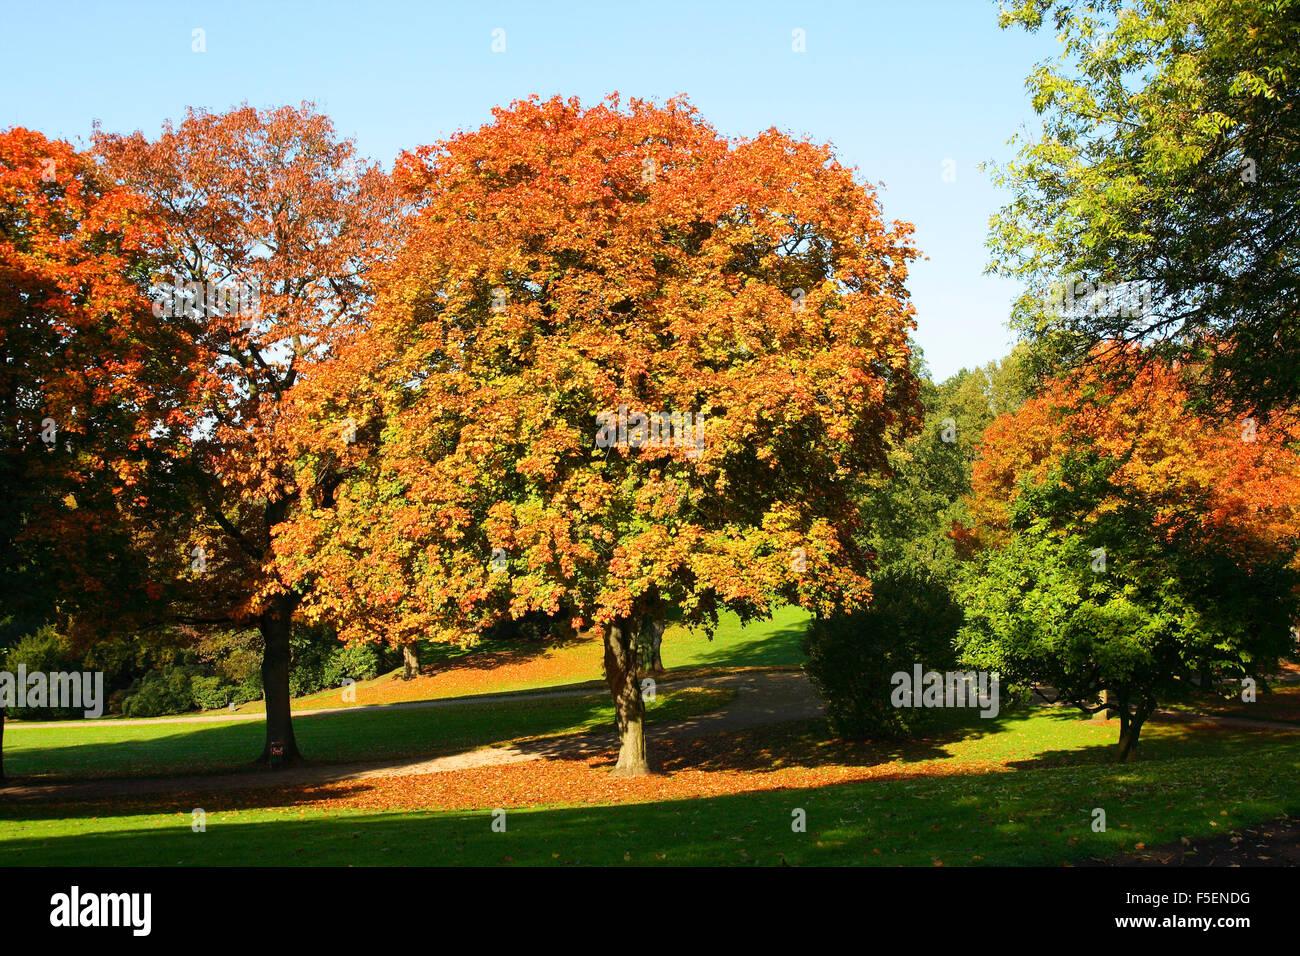 Sycamore Maple Tree, Acer pseudoplatanus. Autumn Stock Photo